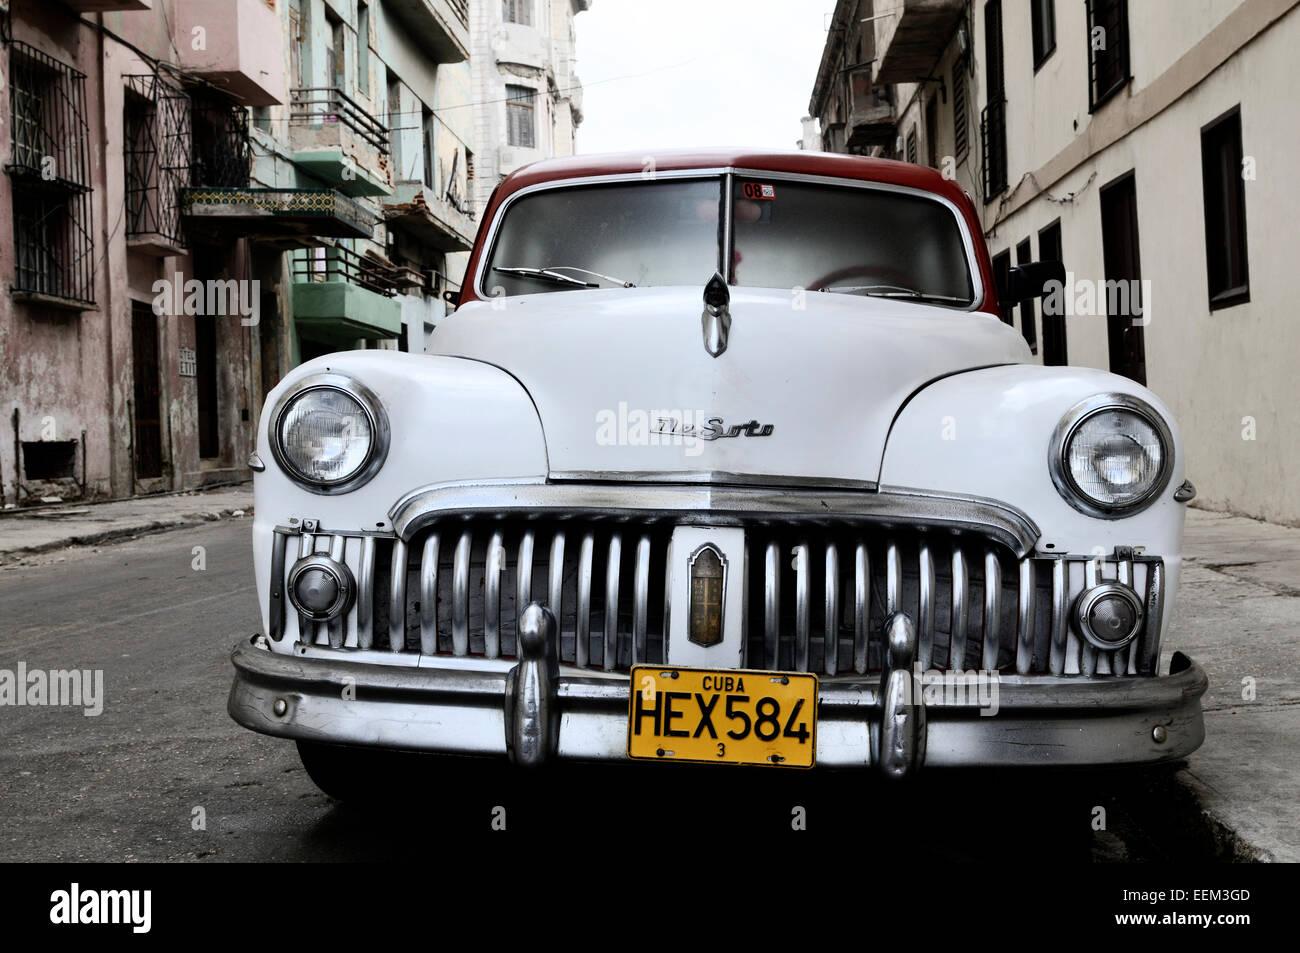 White classic car, Centro Habana, Havana, Ciudad de La Habana, Cuba - Stock Image